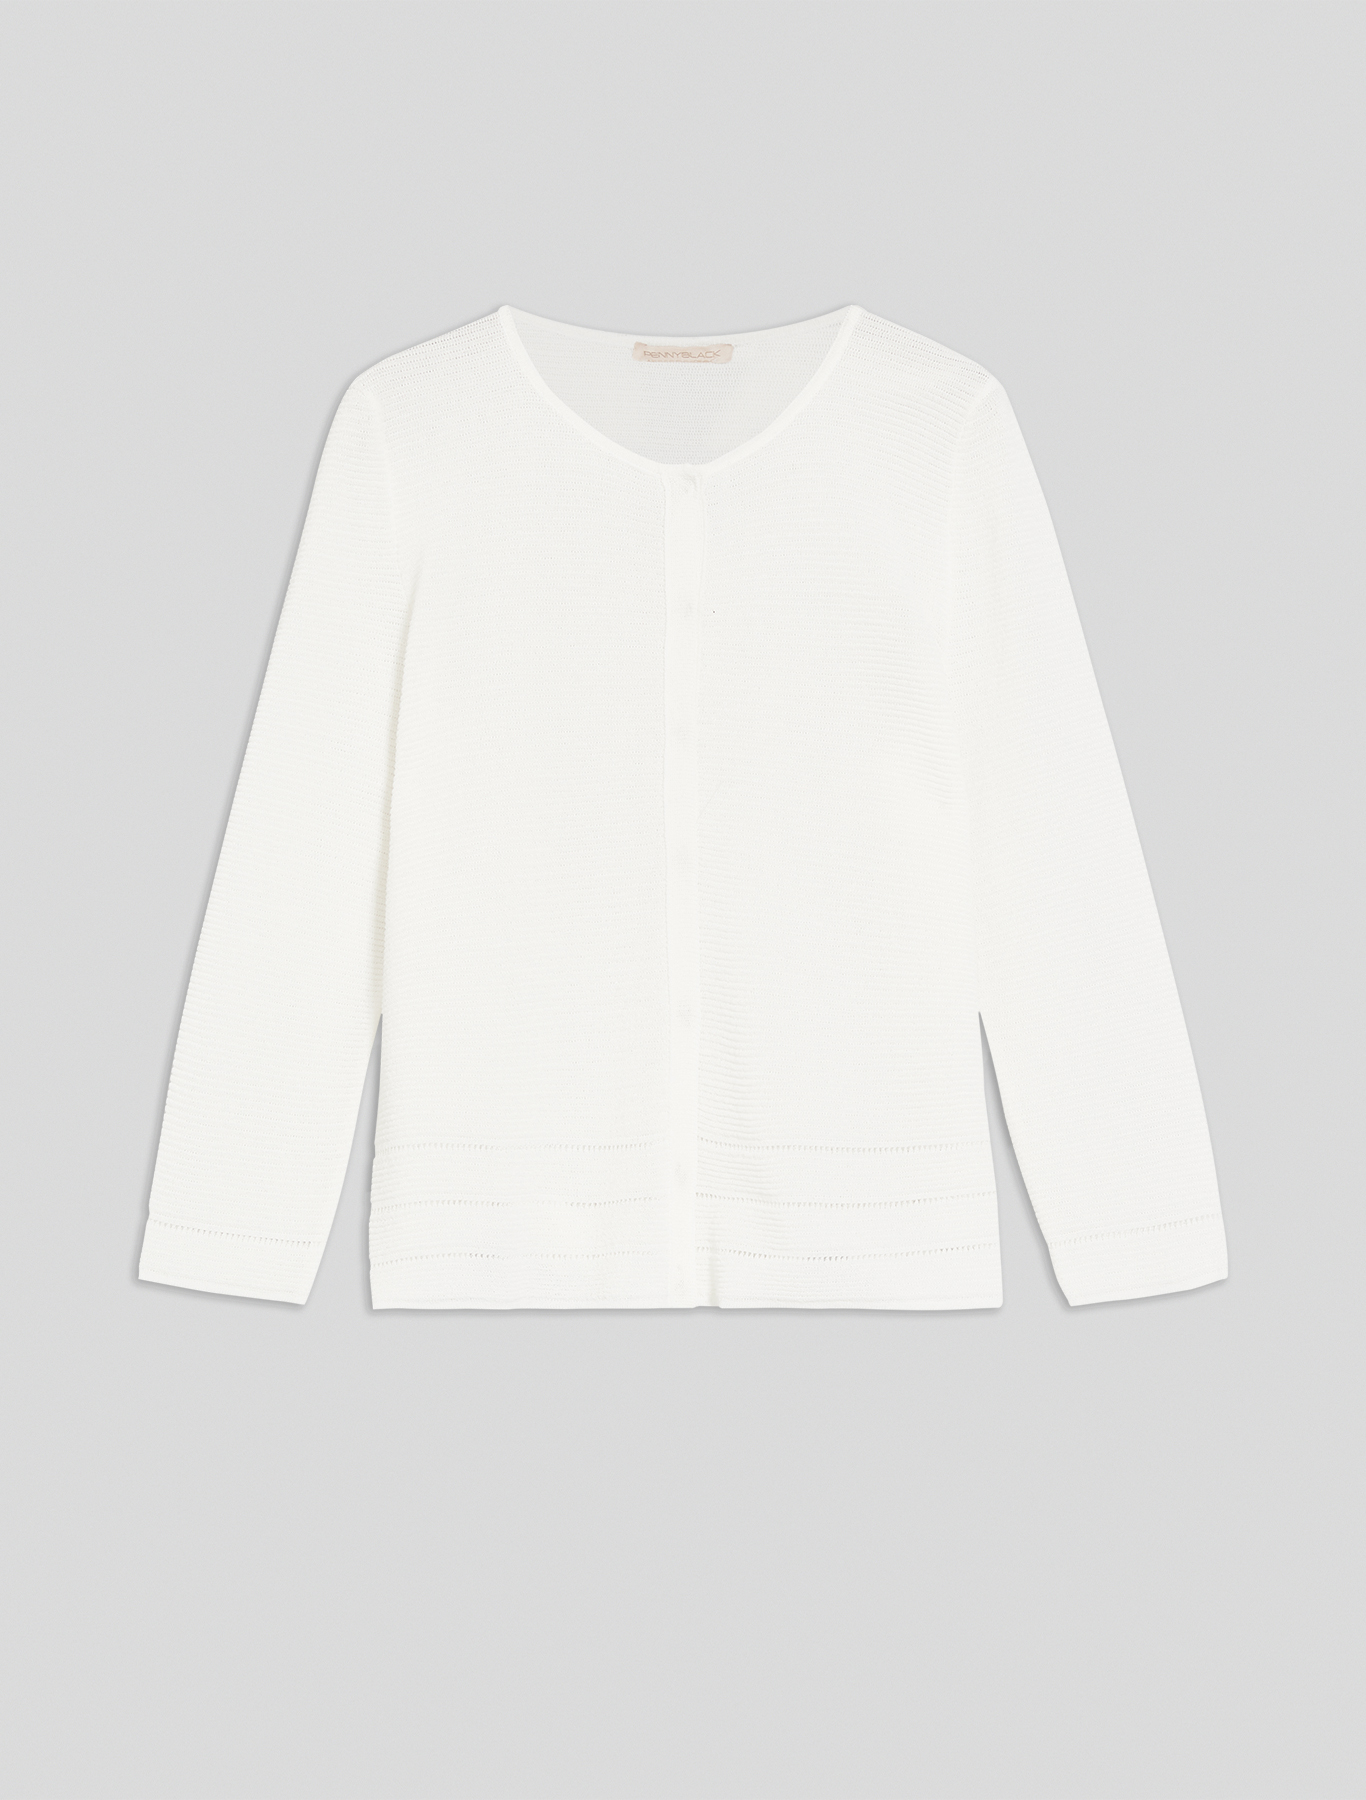 Ottoman tricot Cardigan - white - pennyblack